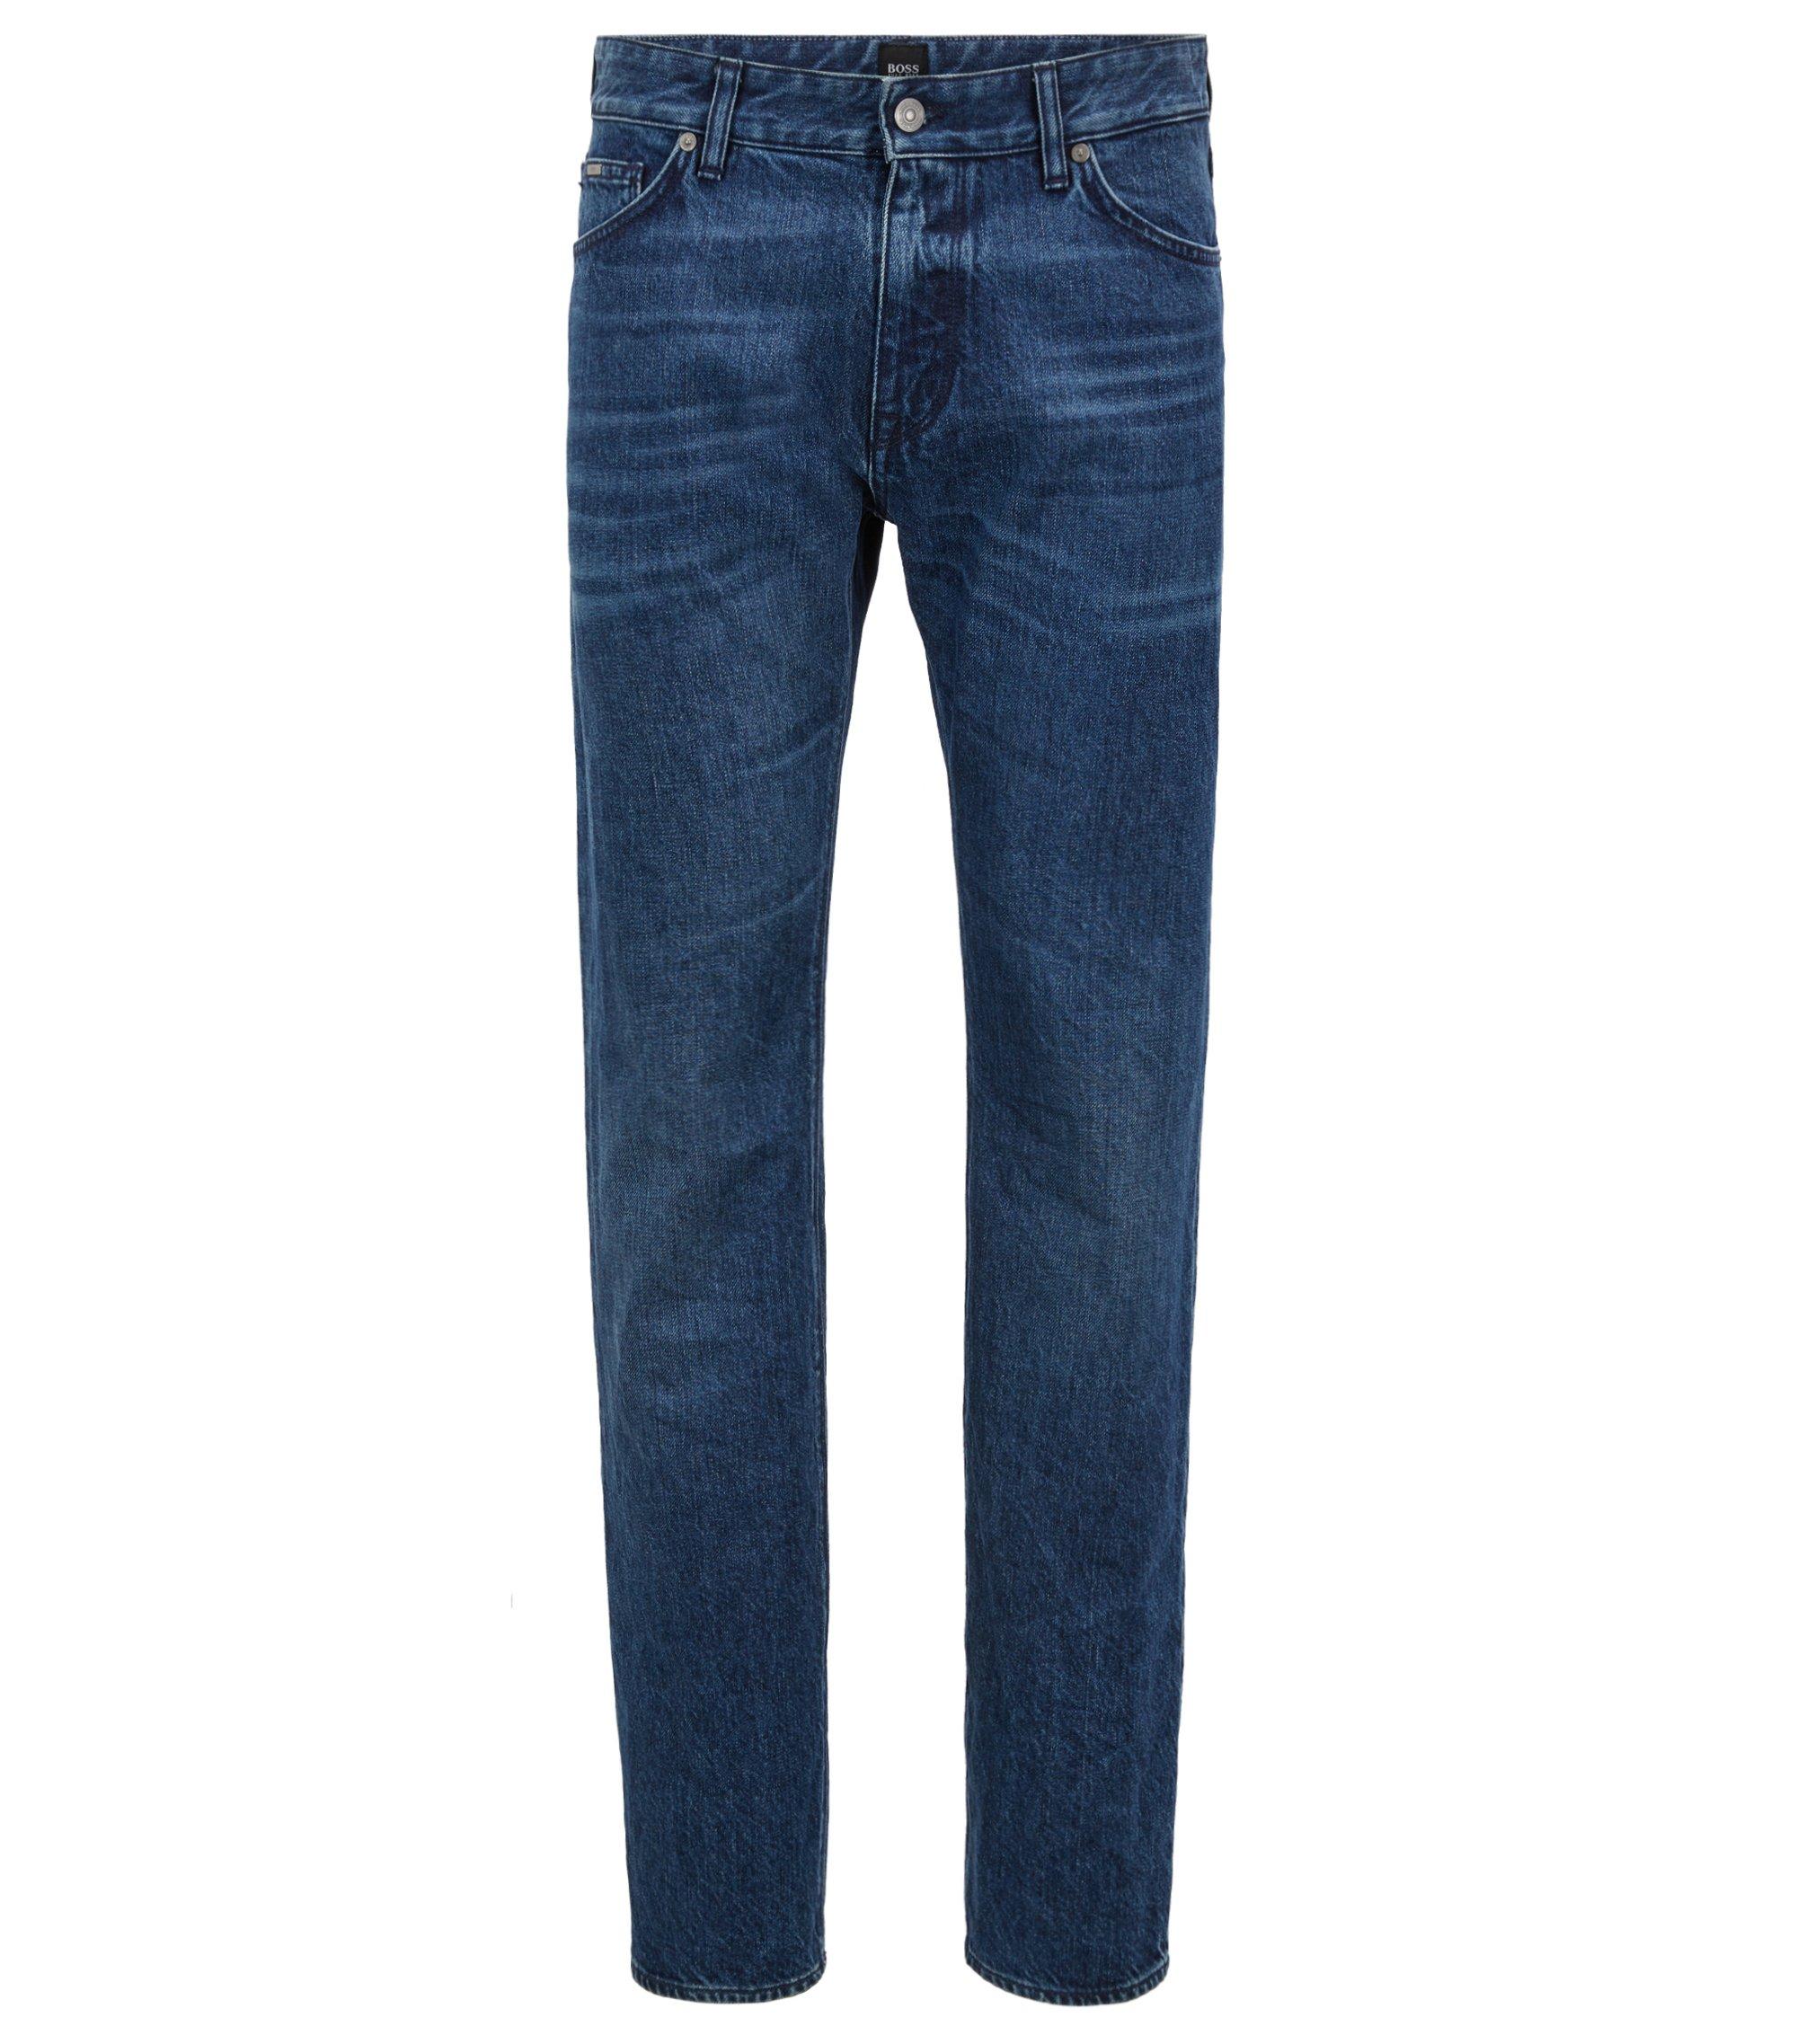 Regular-Fit Jeans aus recycelter Baumwolle, Blau